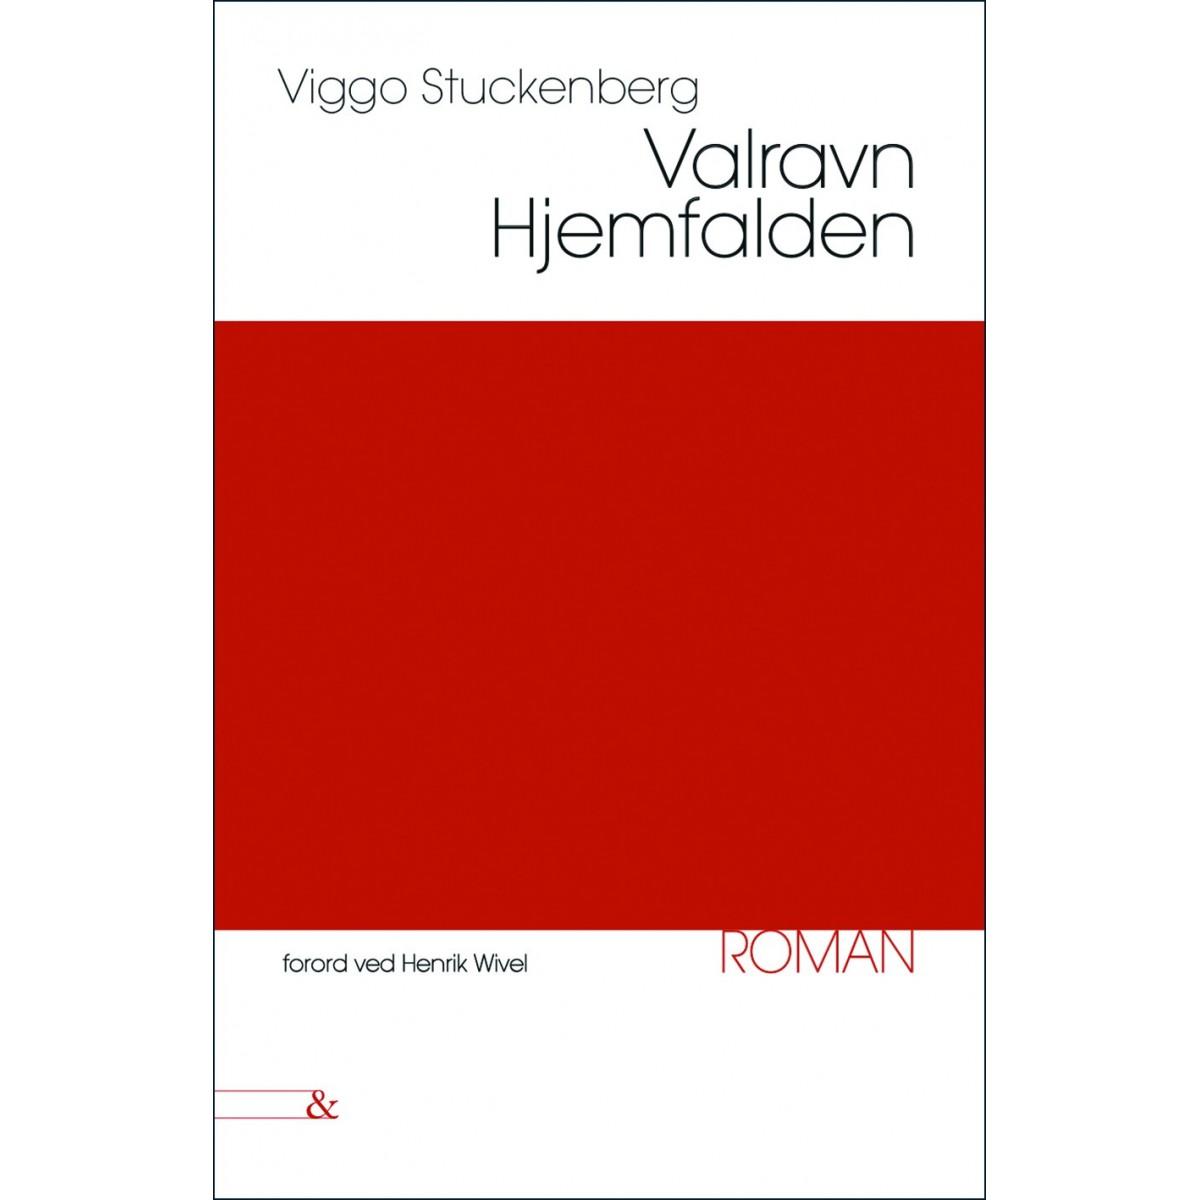 Viggo Stuckenberg: Valravn - Hjemfalden